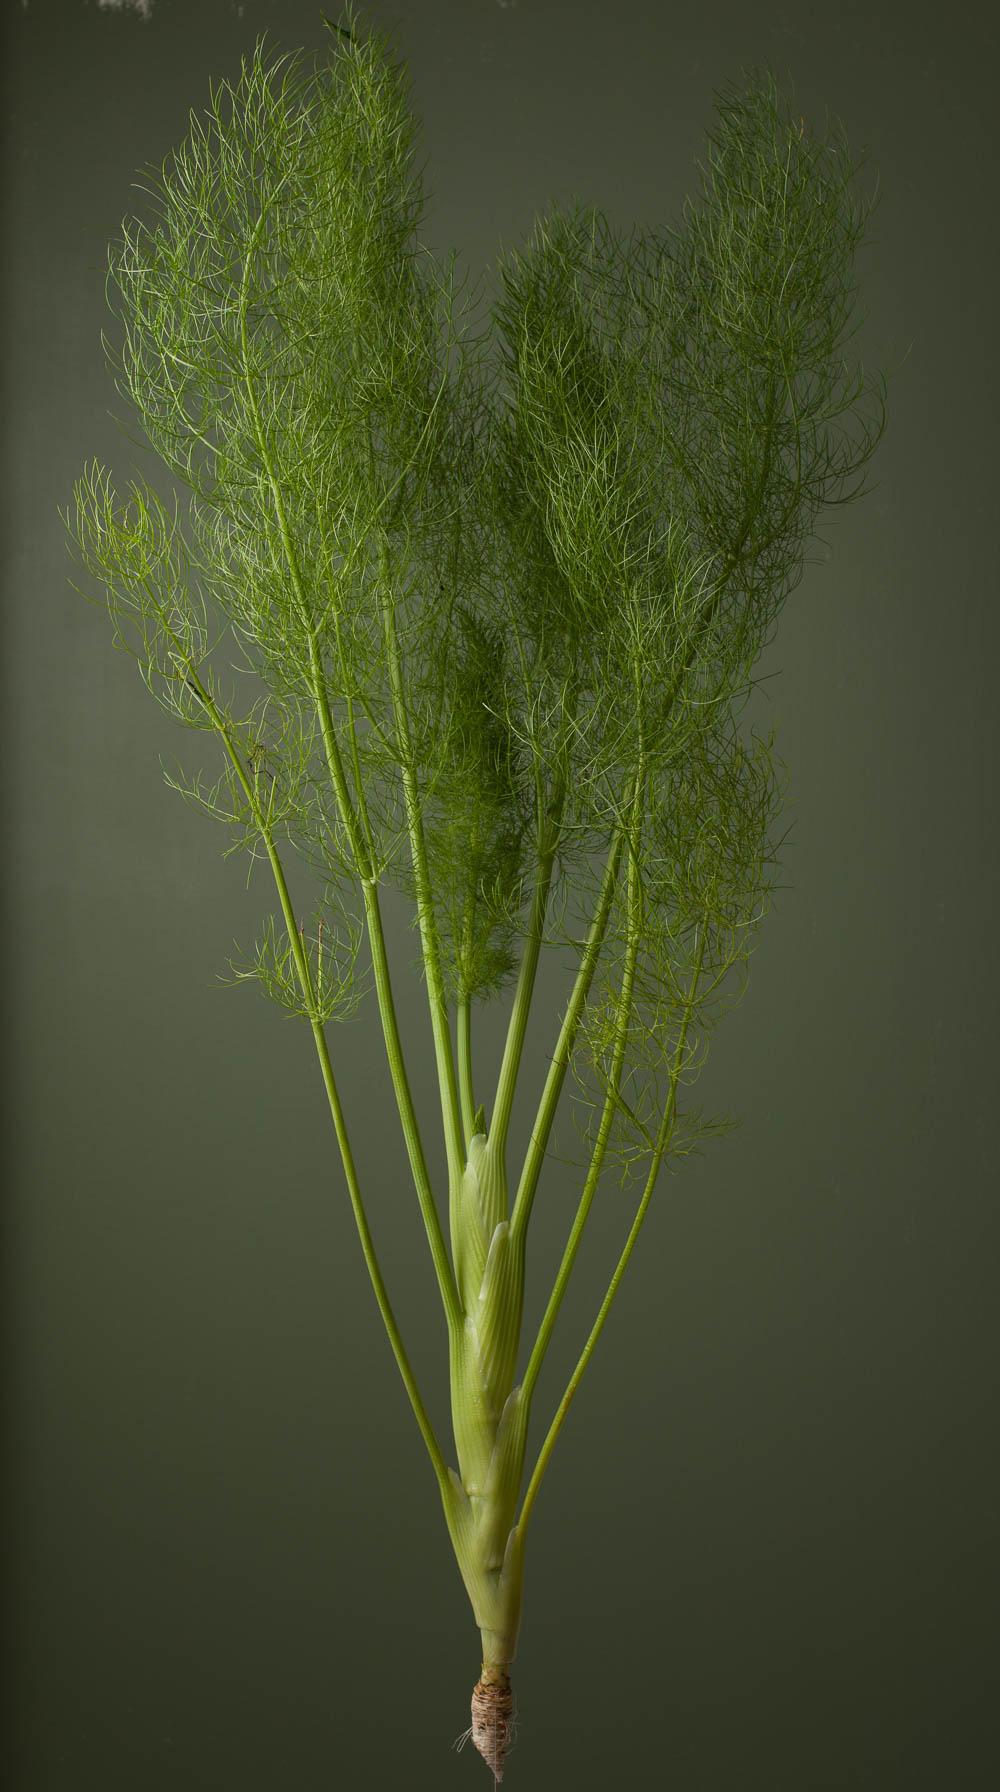 fennel-green-2038.jpg